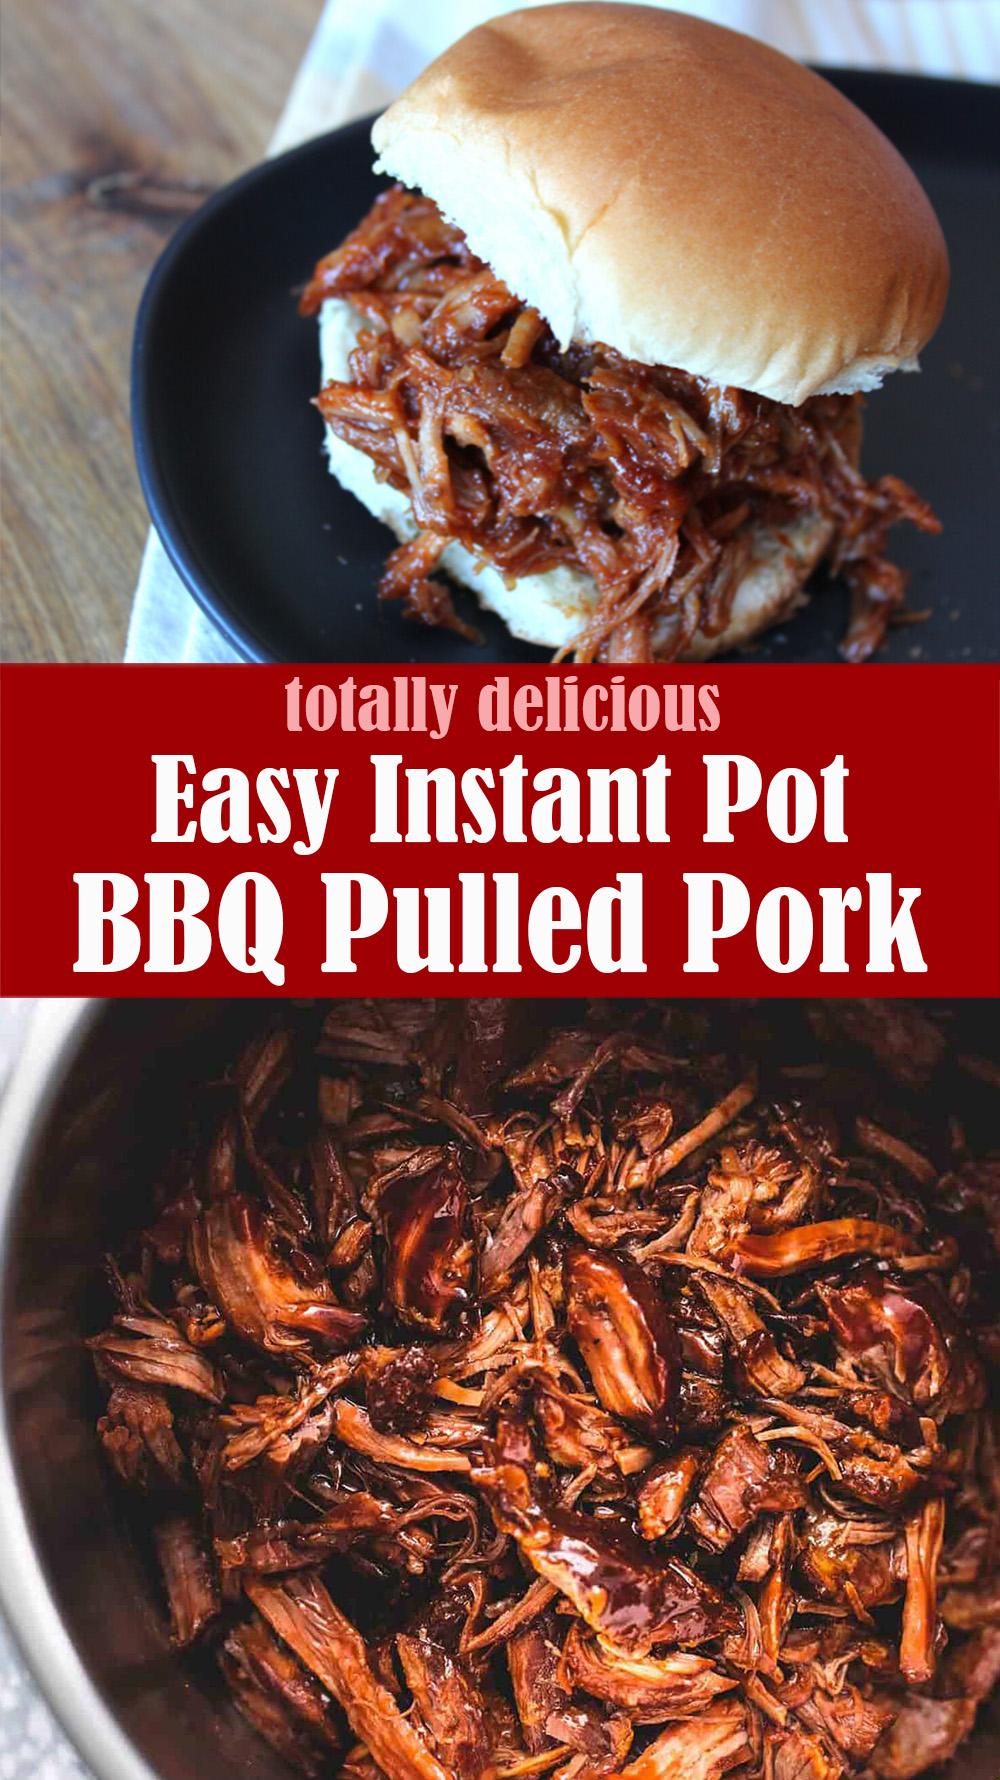 Easy Instant Pot BBQ Pulled Pork Recipe